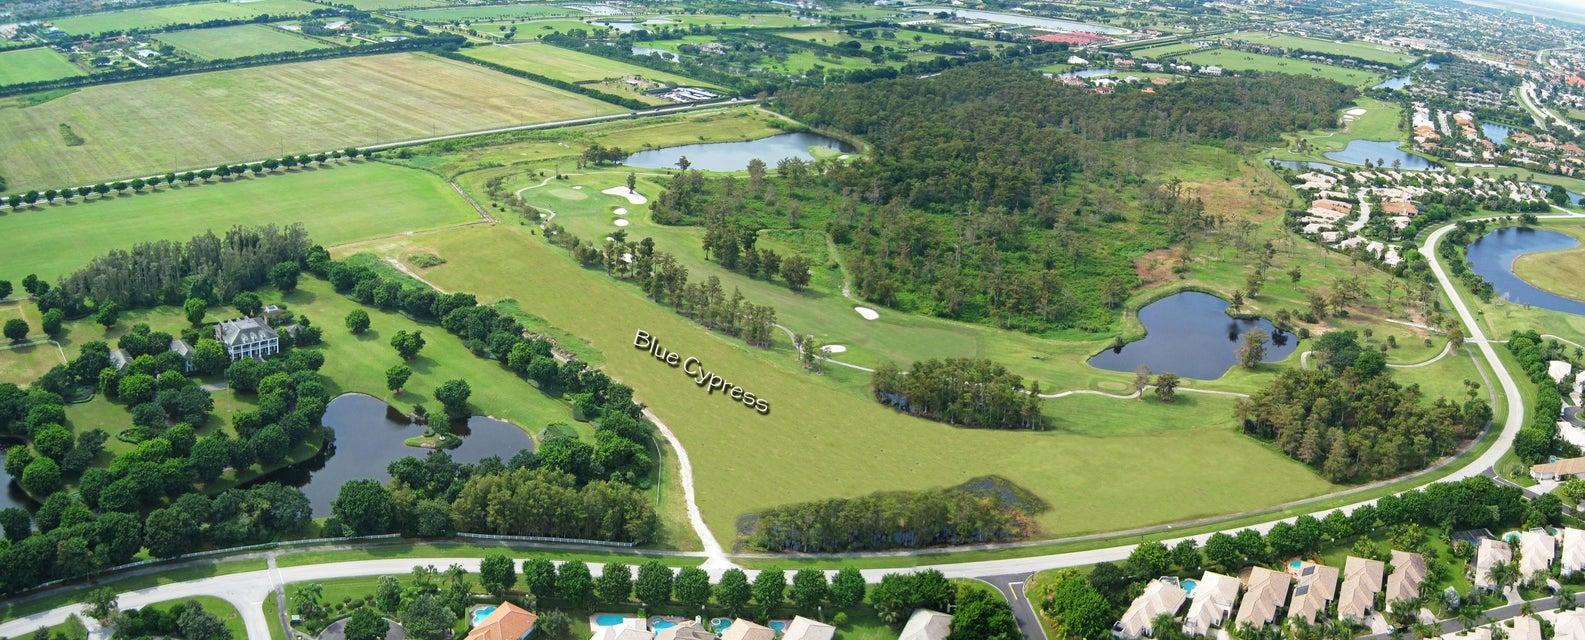 3077 Blue Cypress Lane  Wellington FL 33414